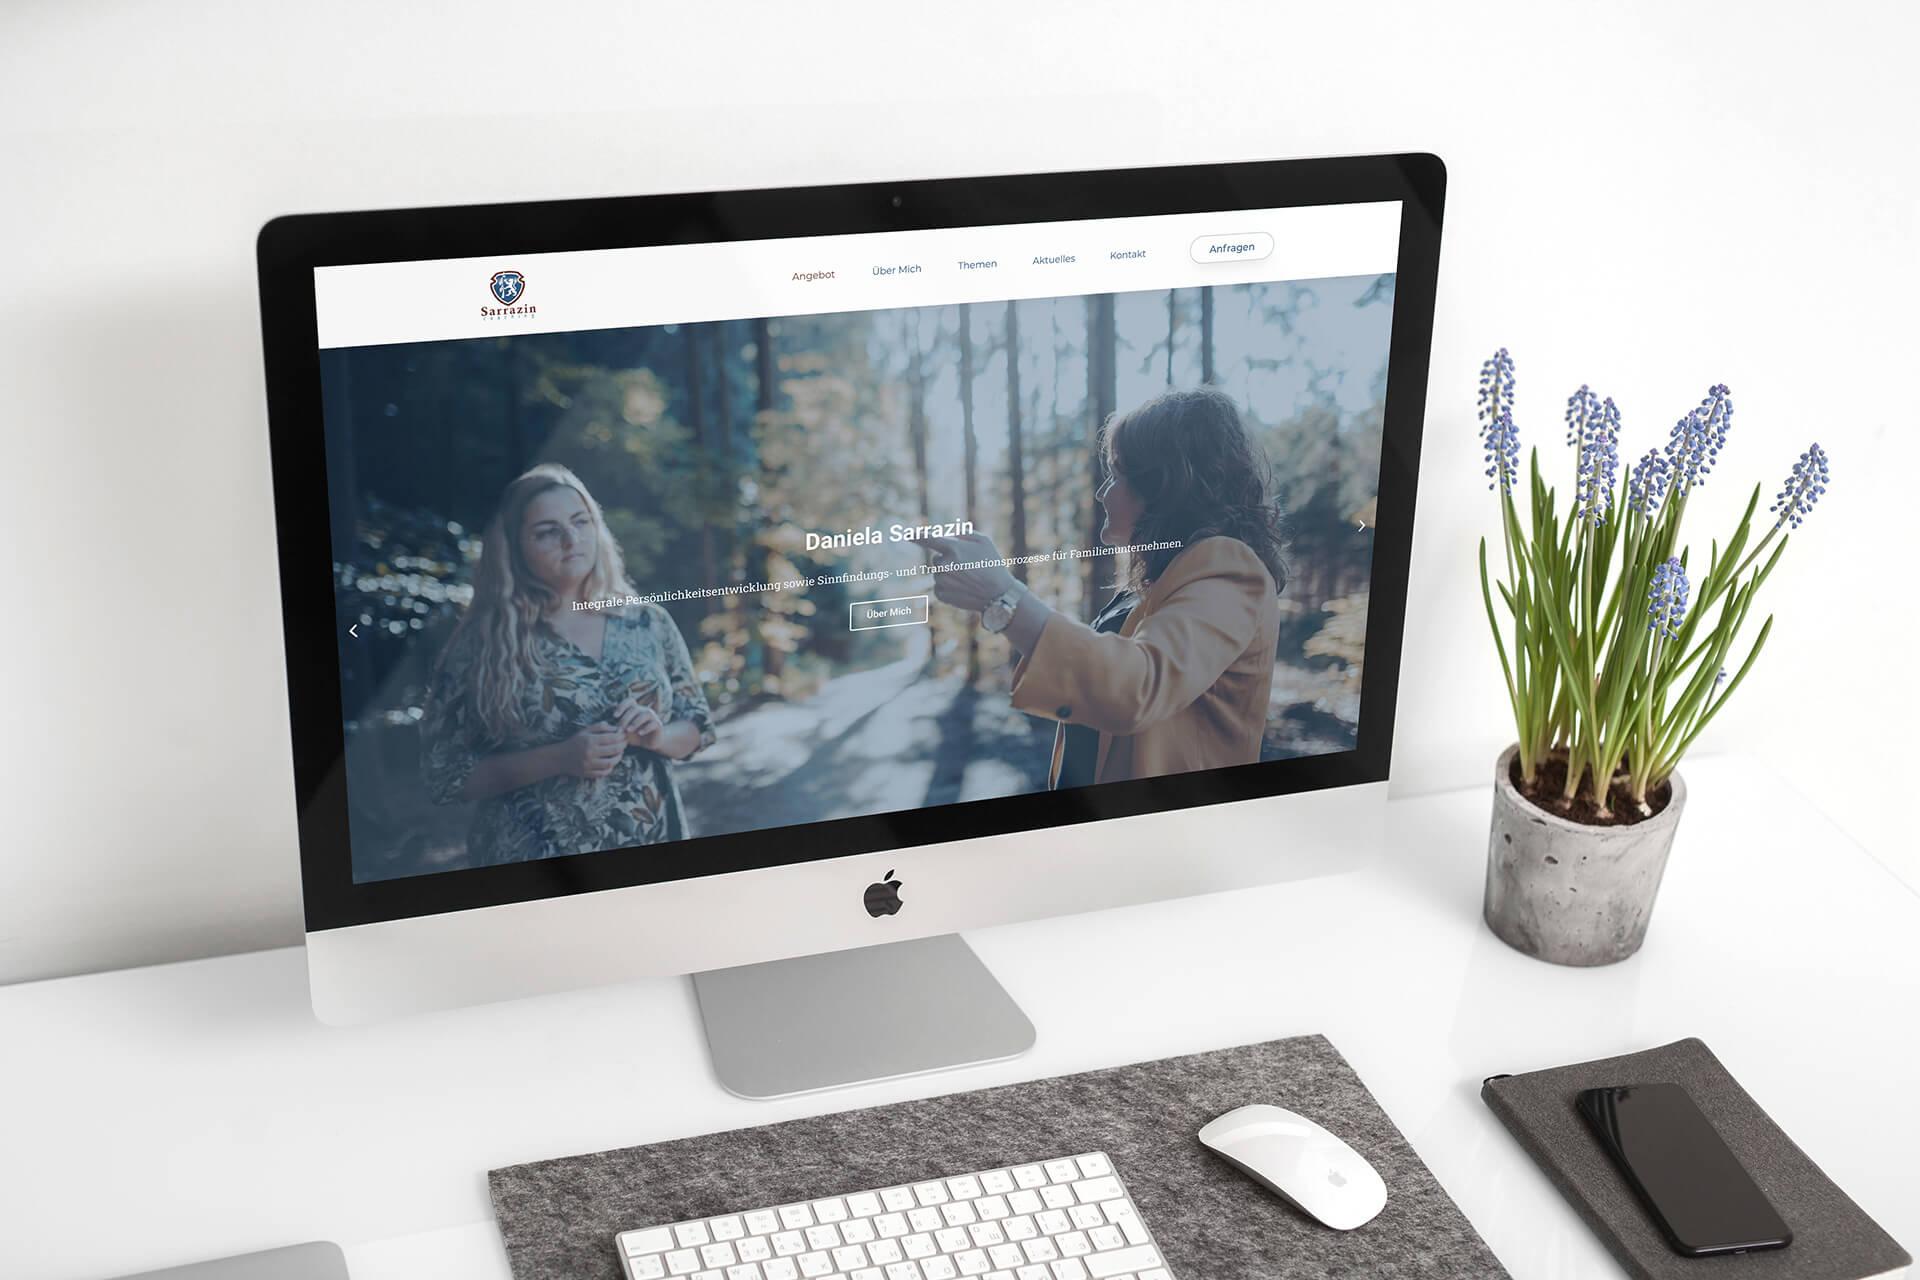 gniced-daniel gross-pfaffenhofen-grafikdesign-digital-webdesign-webentwicklung-6